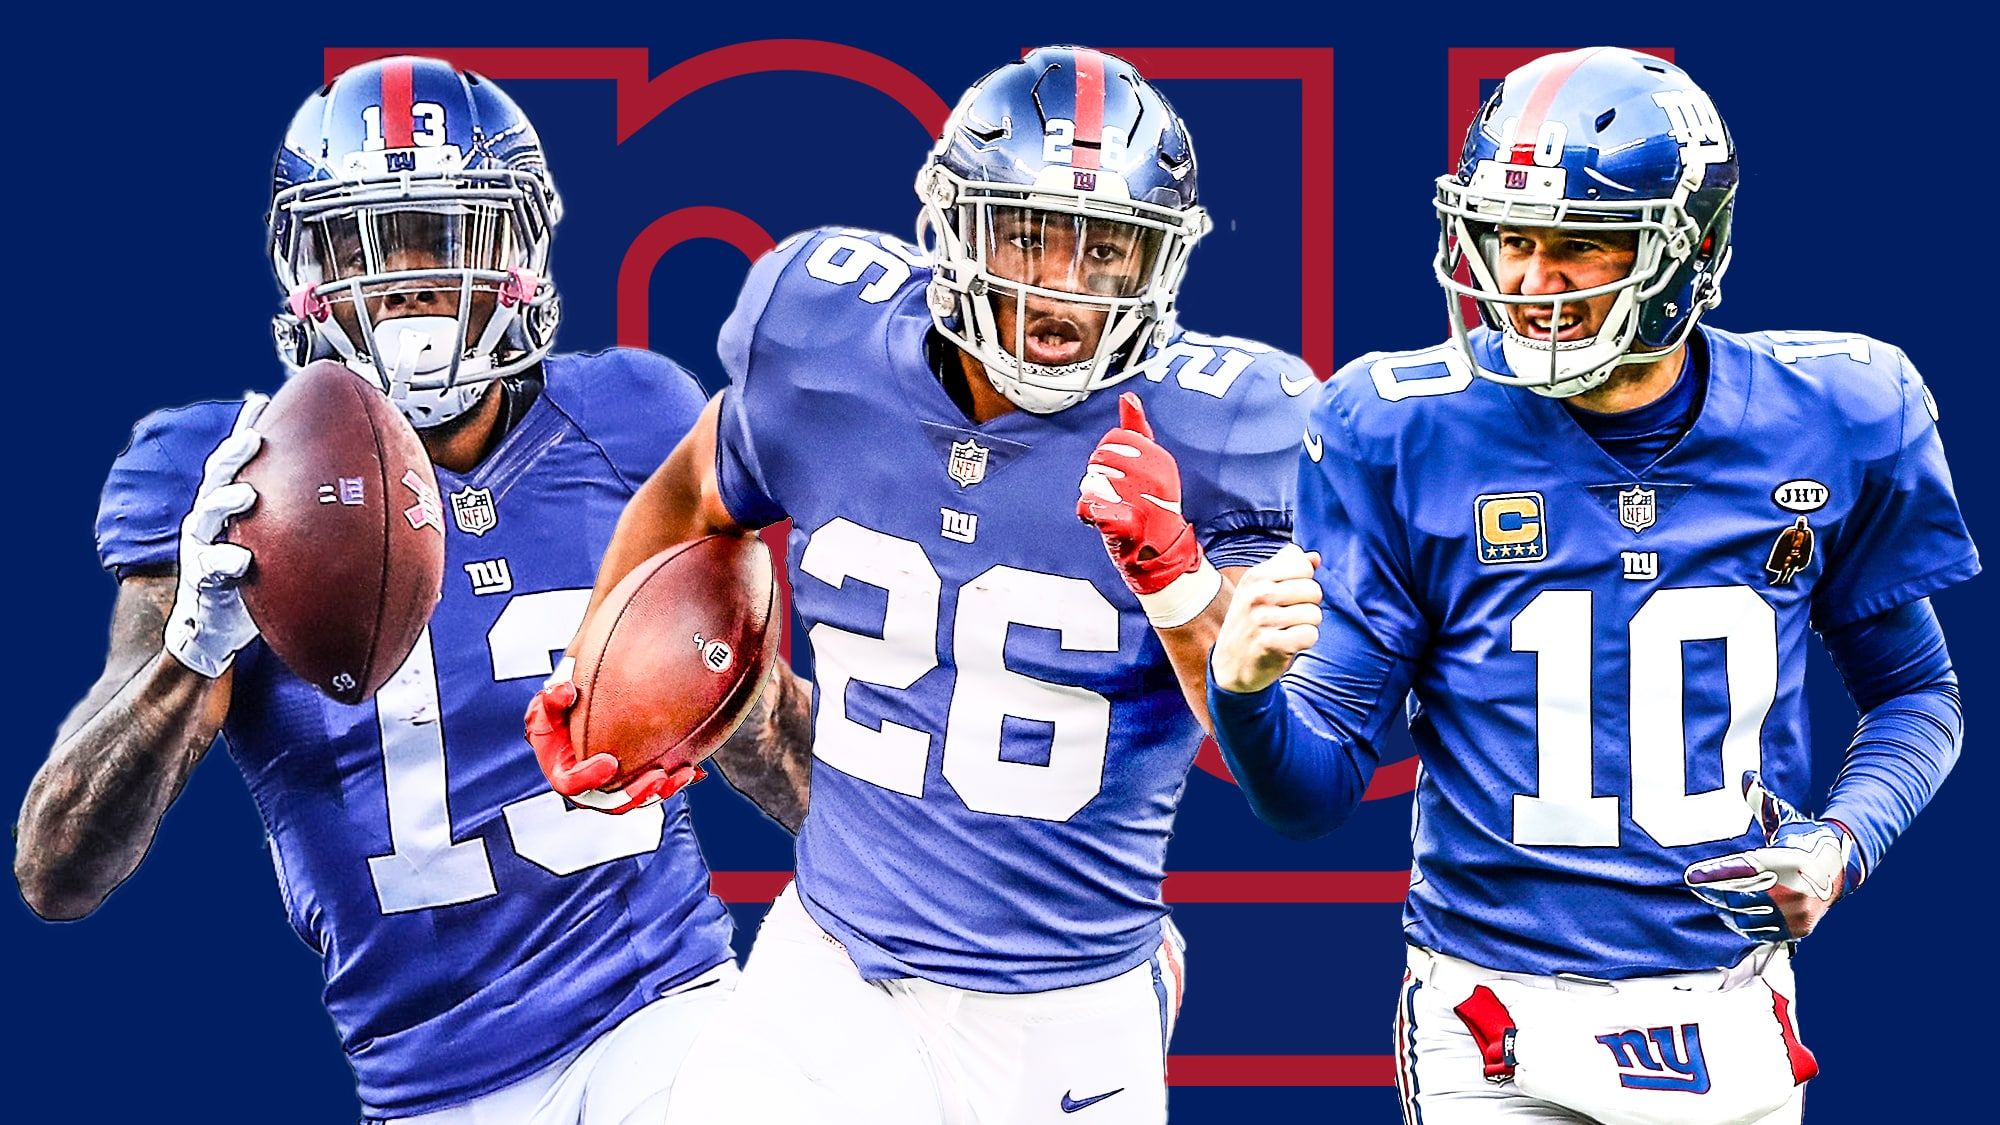 New York Giants game live stream